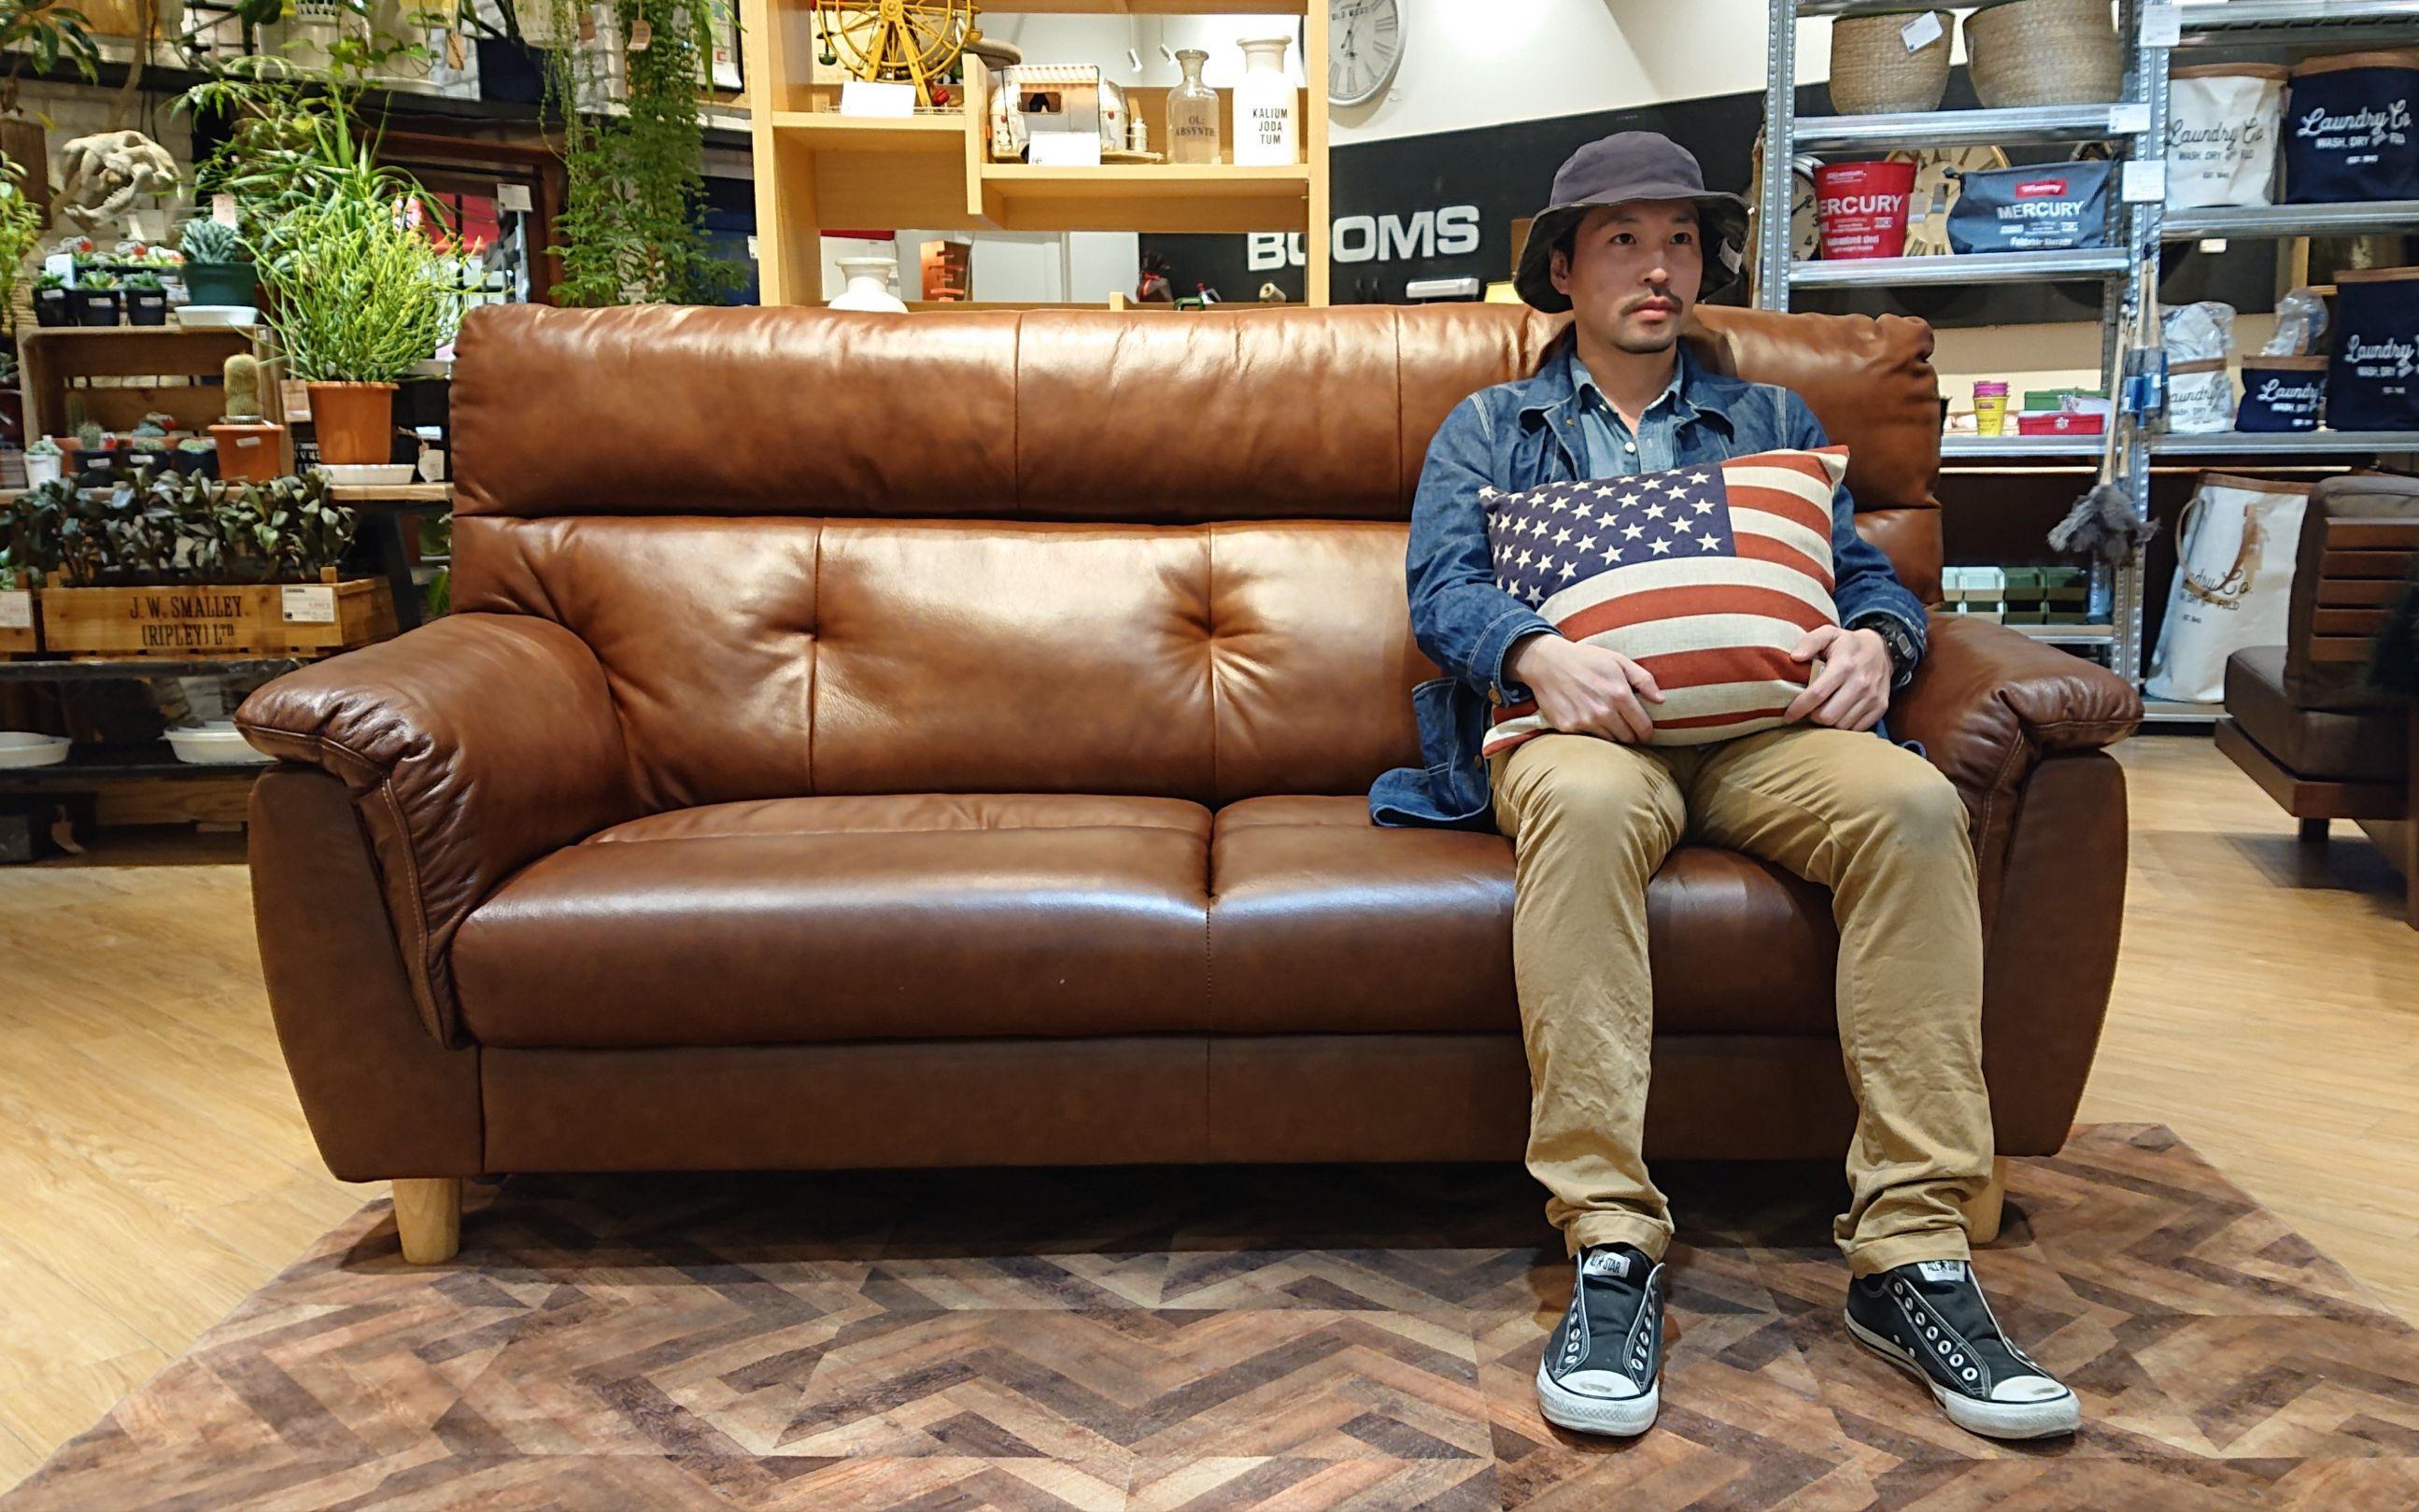 【BOOMS】個性派家具専門店ブームス|茨城~ 取手つくば~流行のおしゃれ家具&インテリア